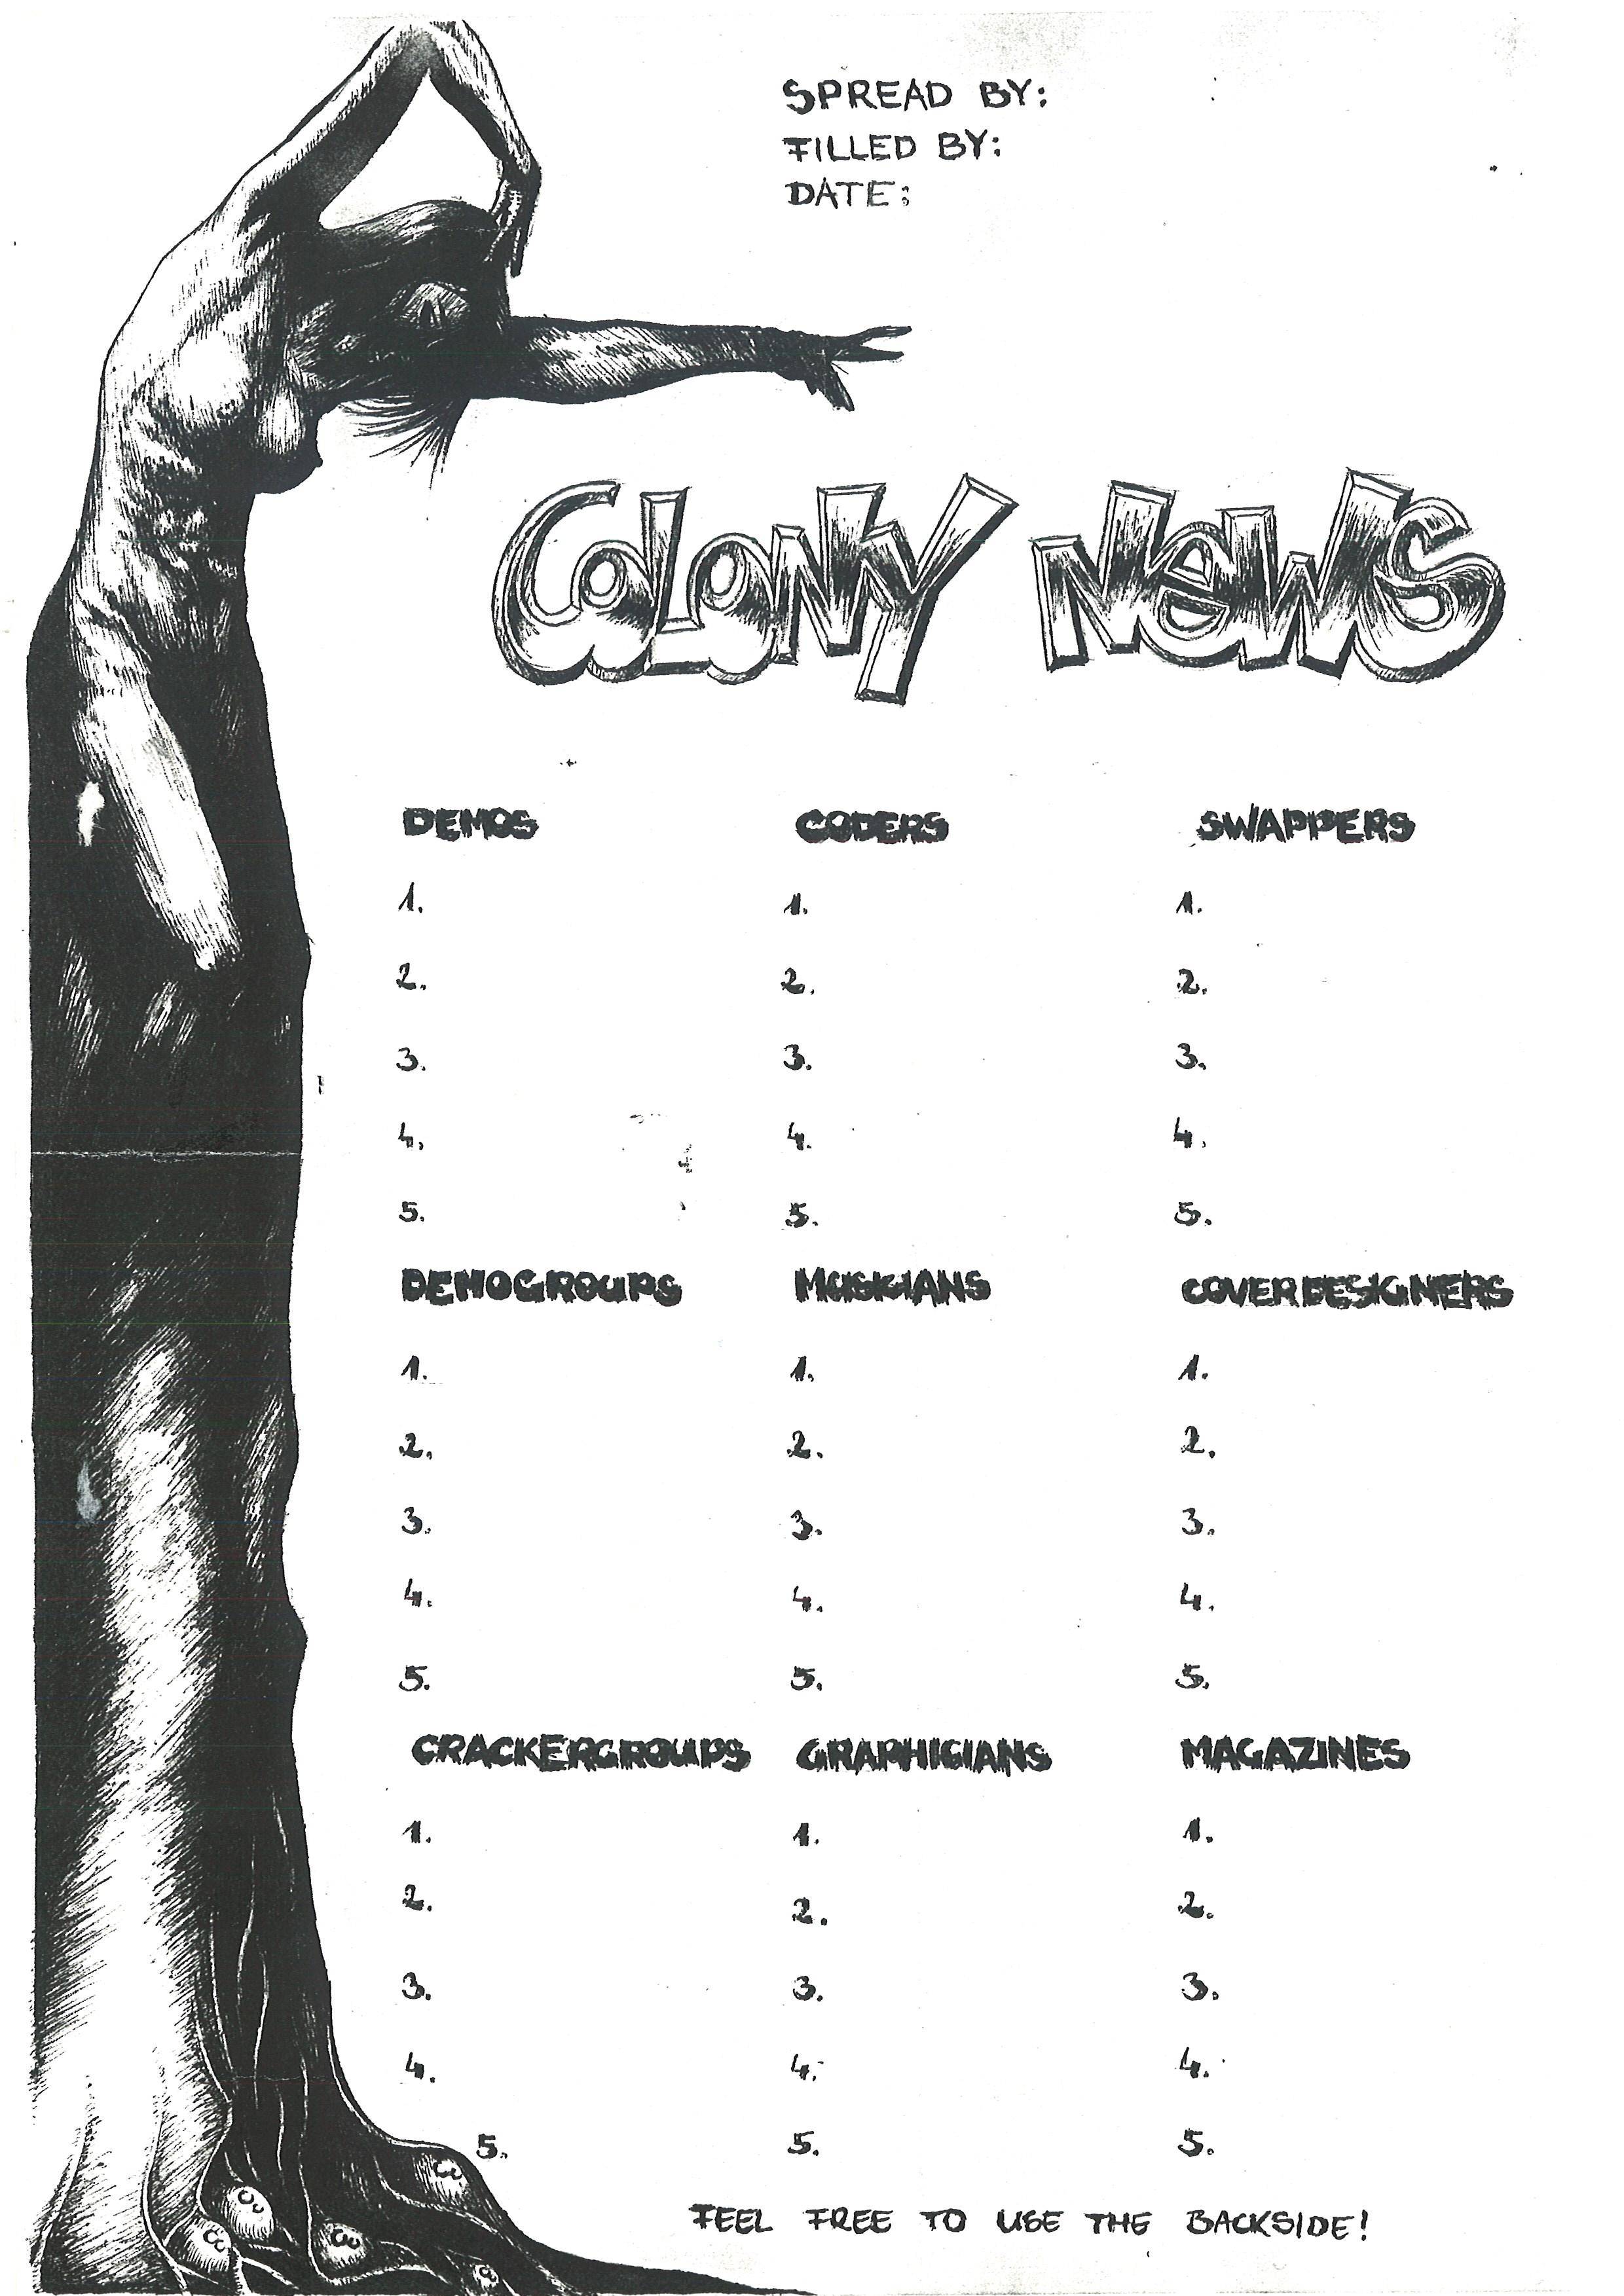 detailed look 68b9d eefeb Blasphemy votesheet, 1990s  link  • Channel II votesheet, 1999  link  •  Colony News votesheet, between 1997 and 1999  link